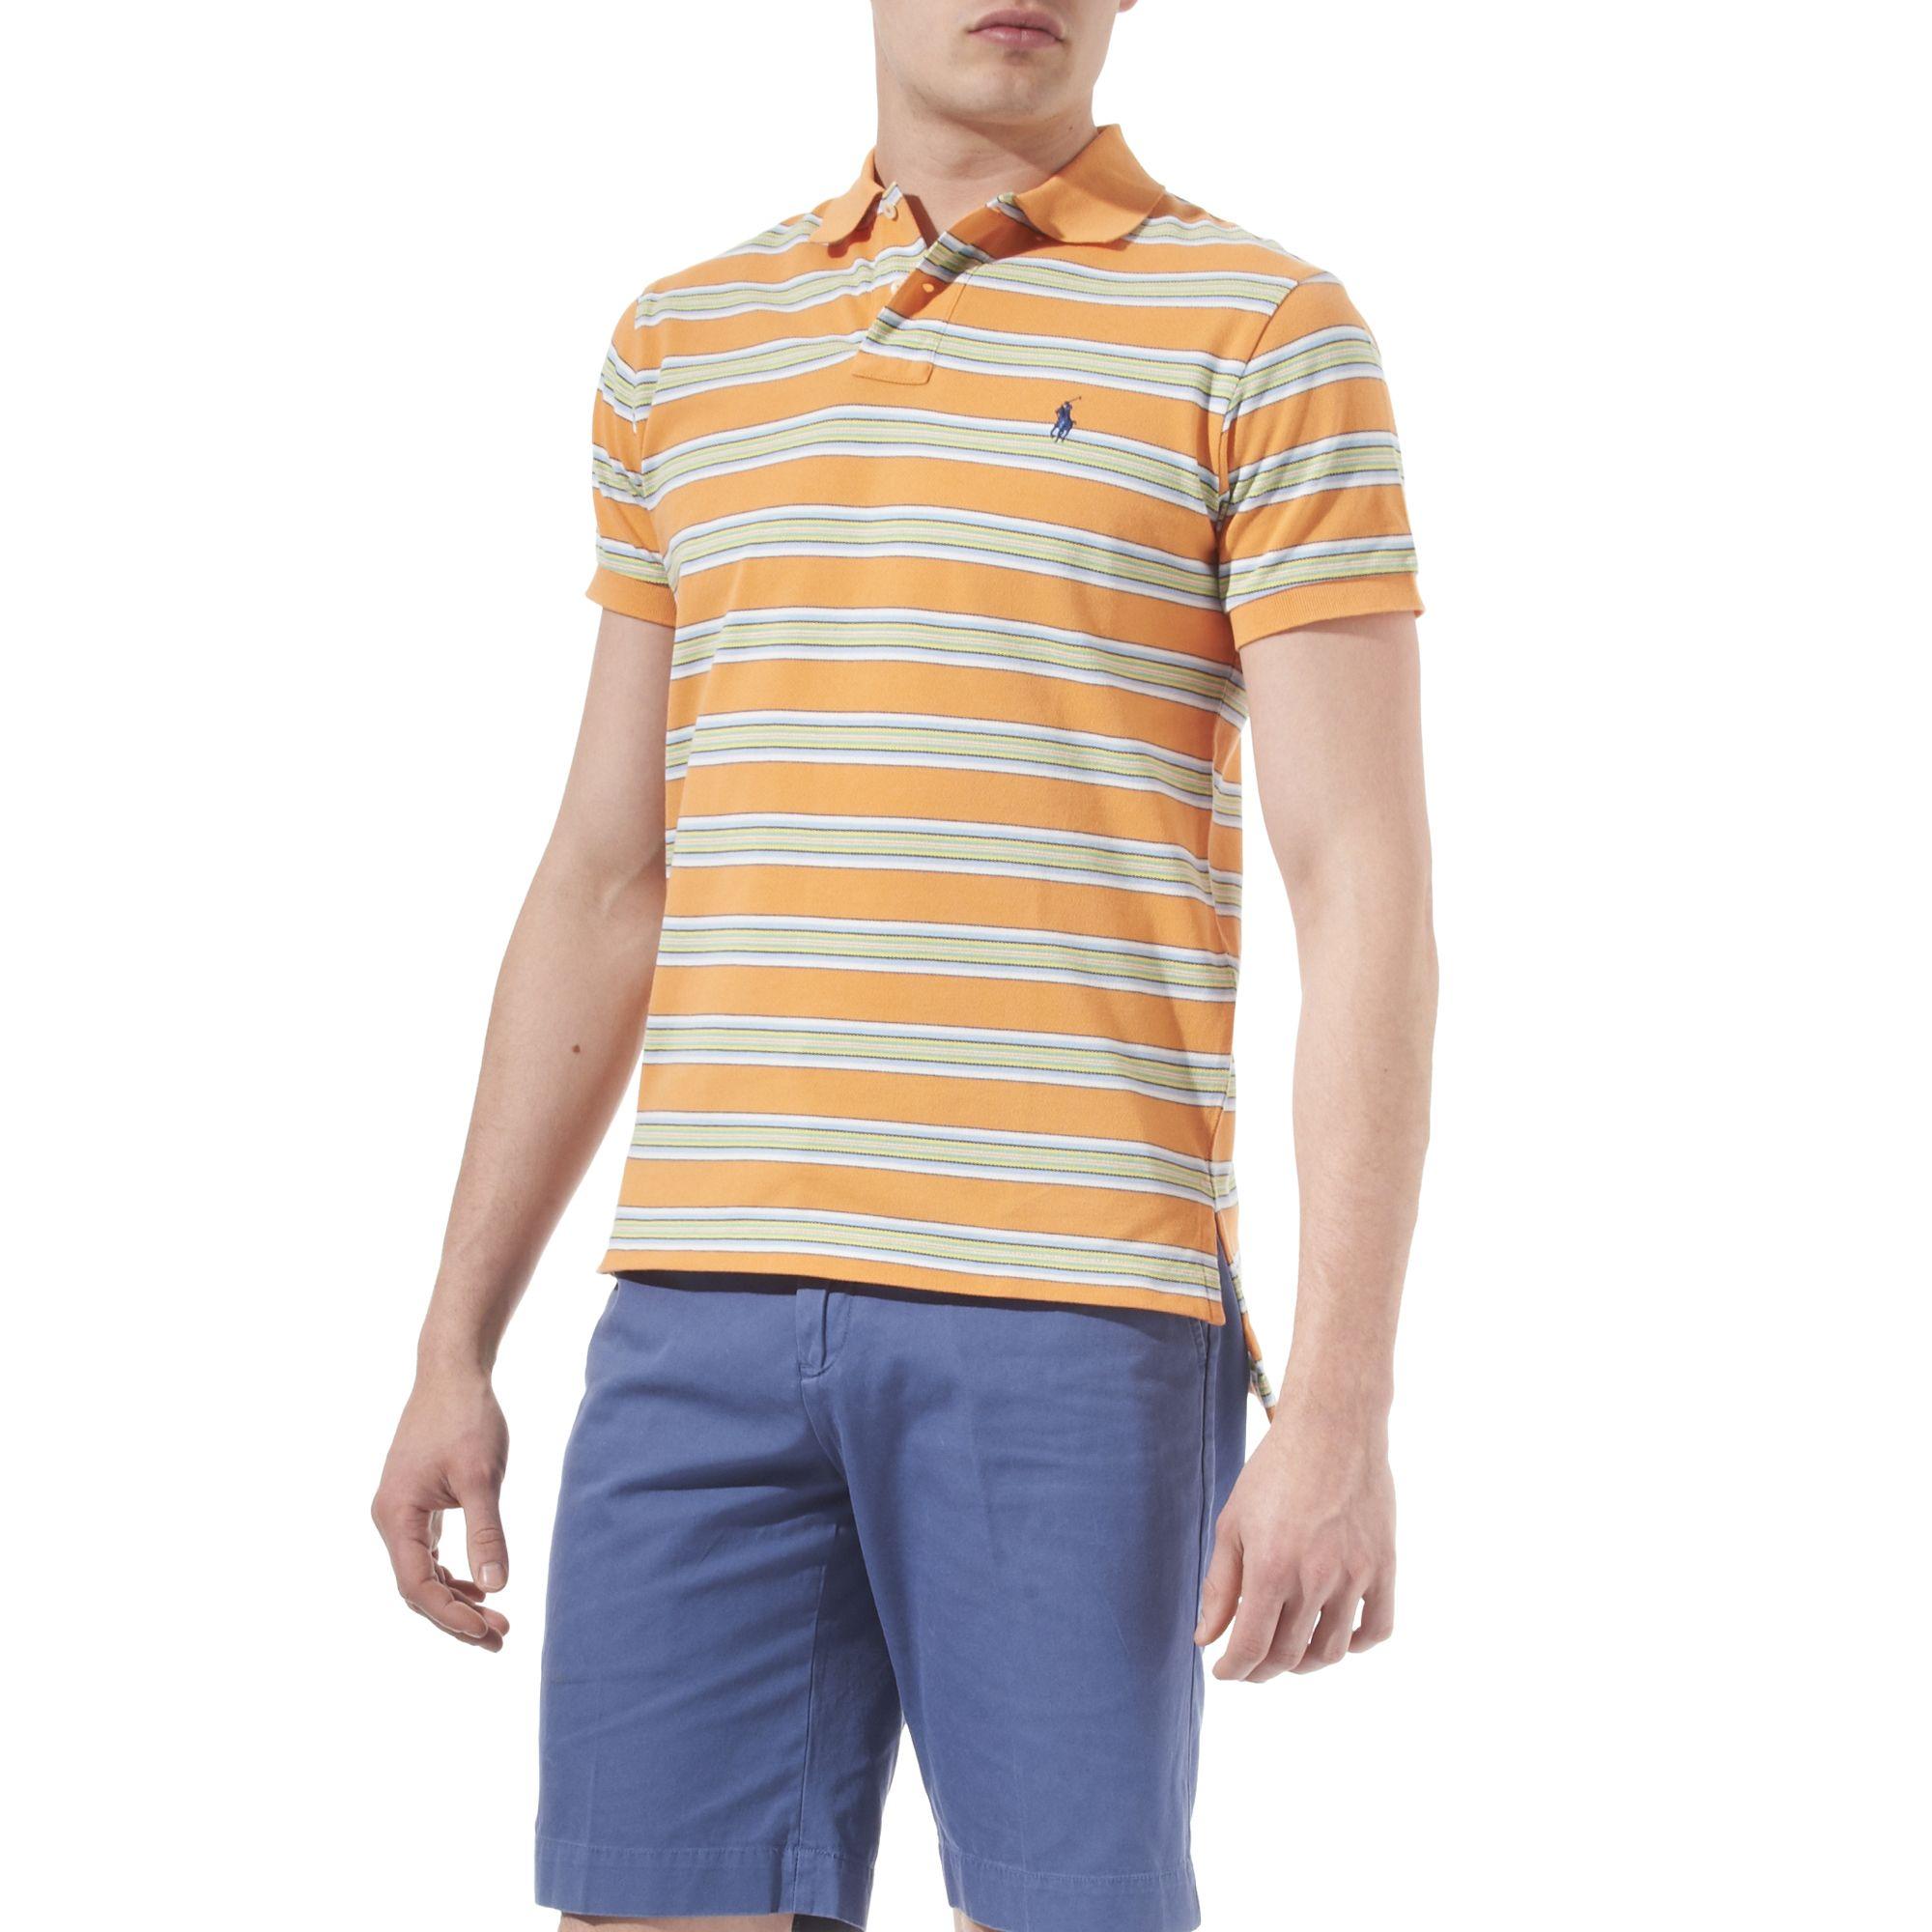 Ralph lauren horizontal striped polo shirt in multicolor for Horizontal striped dress shirts men